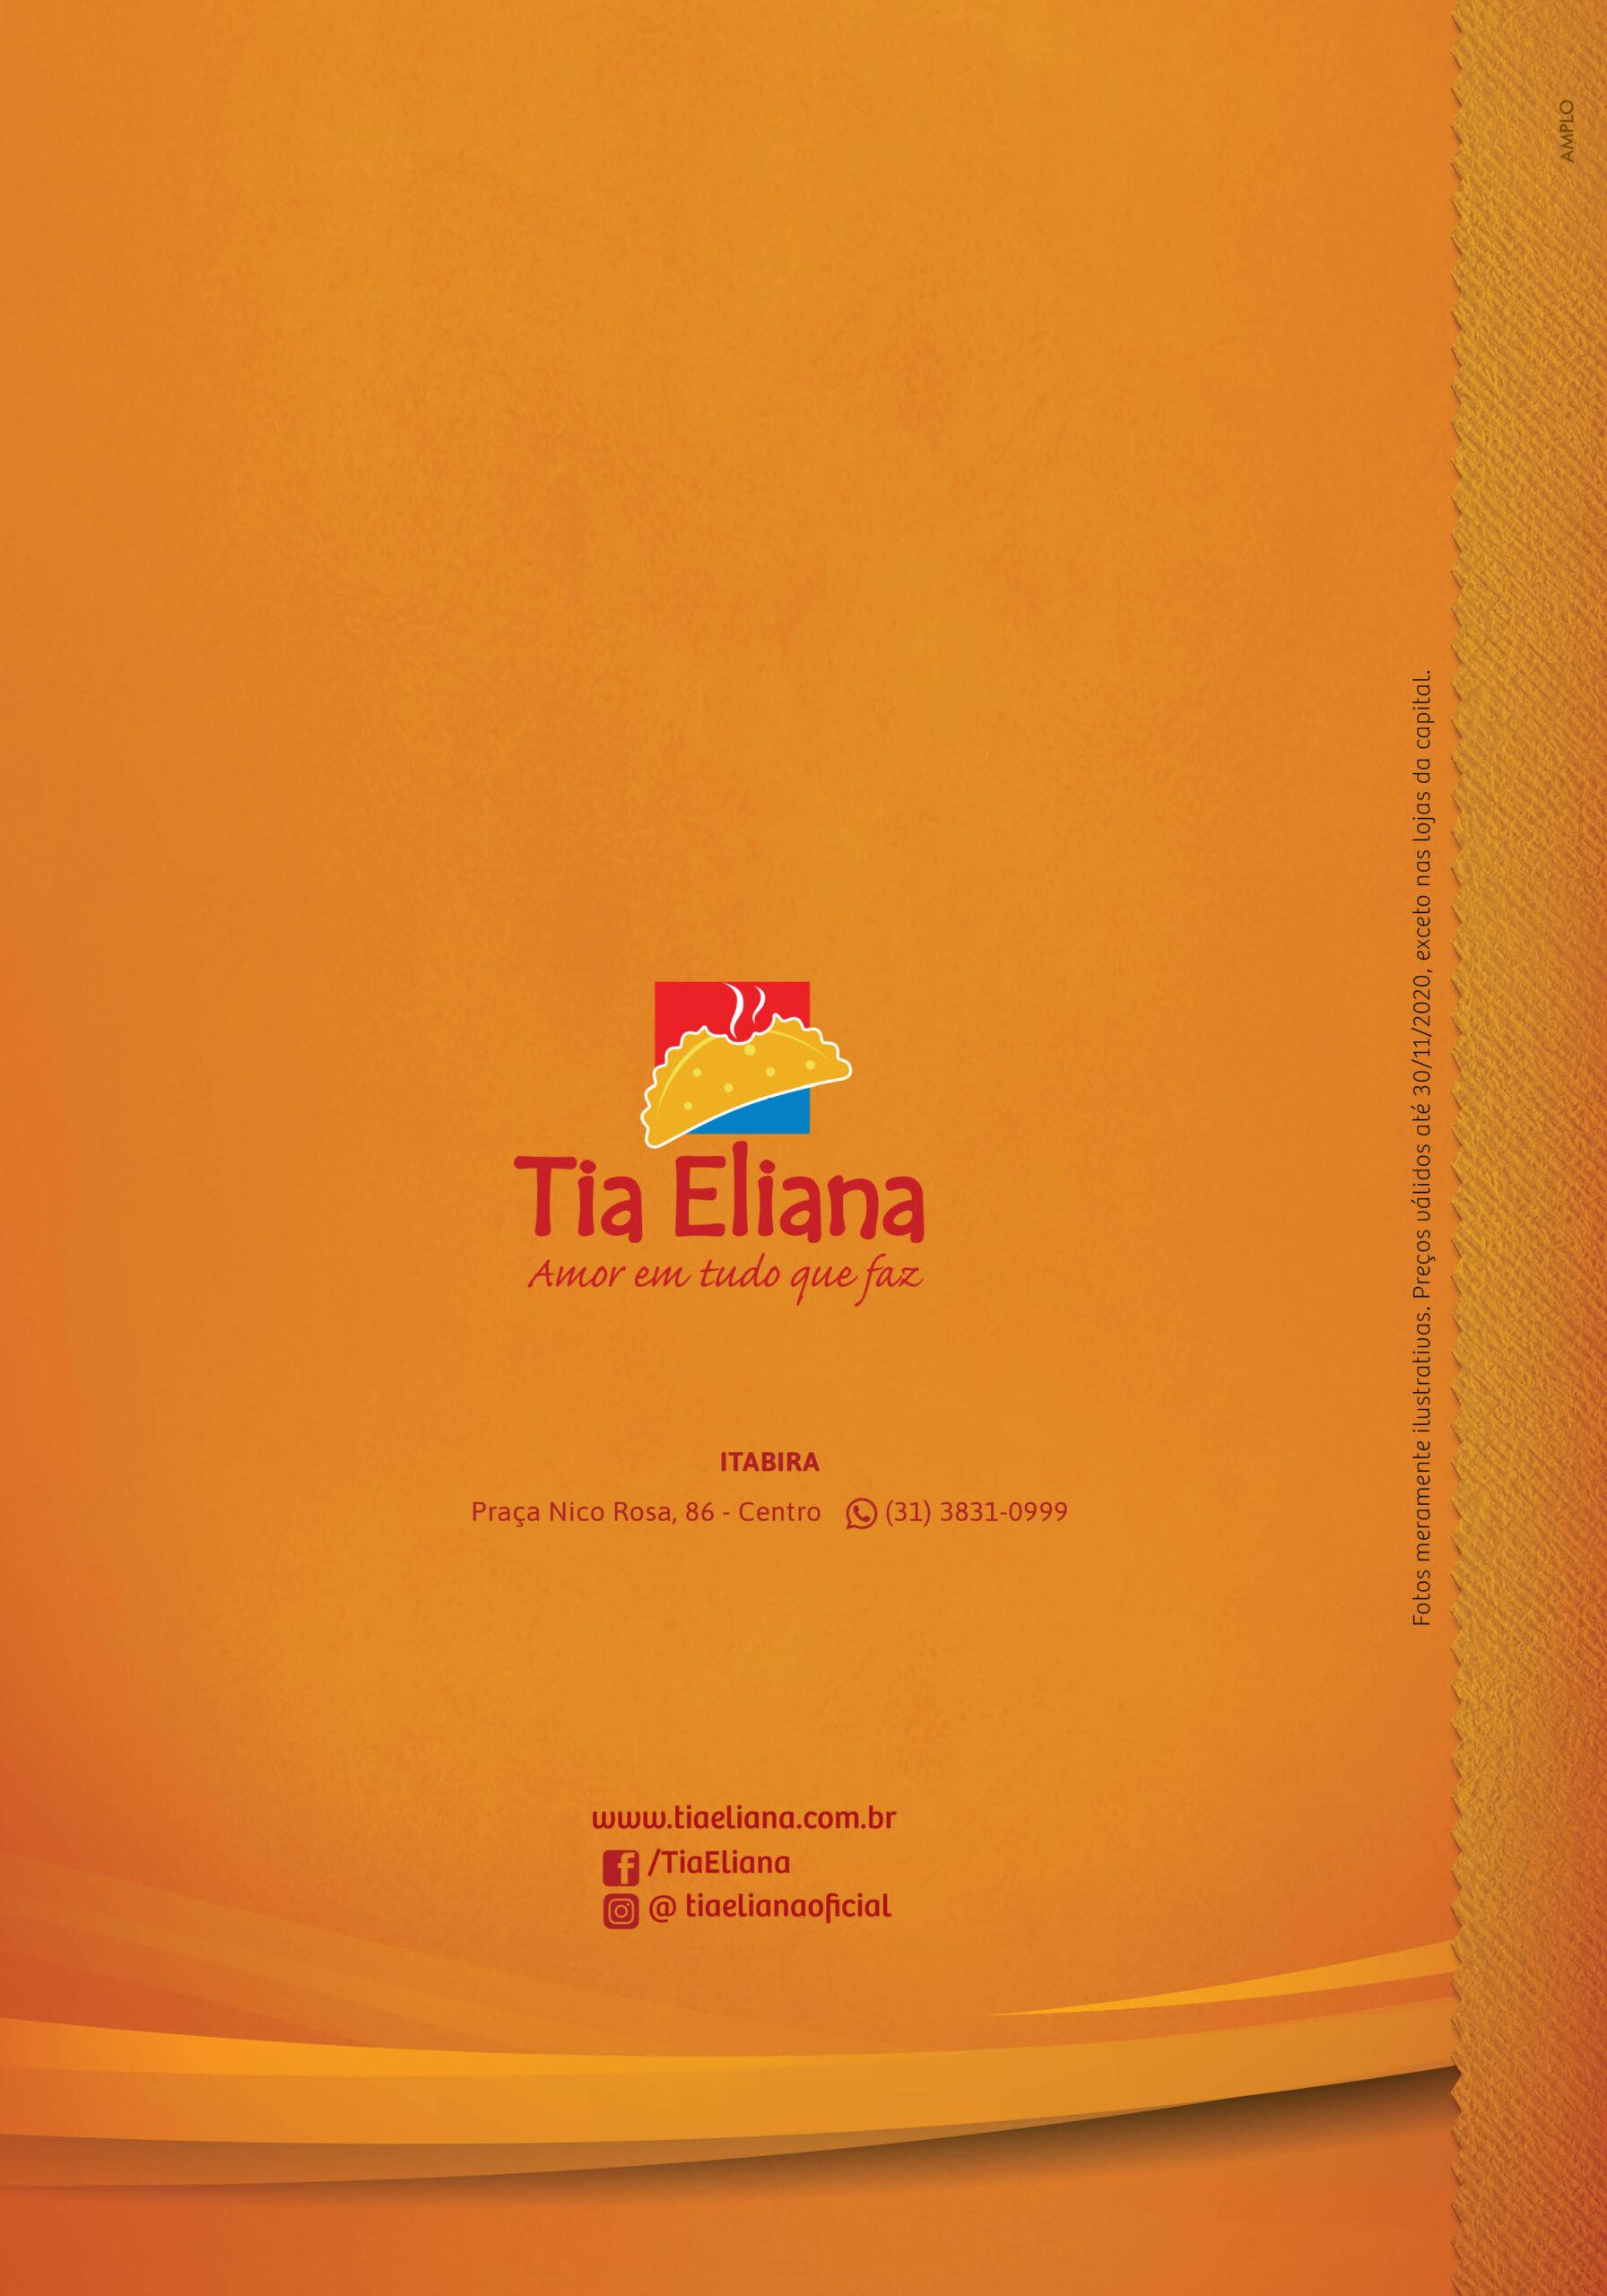 cardapio_completo_interior_a4_2021_tia_eliana_itabira_nr12-scaled Itabira - Praça Nico Rosa